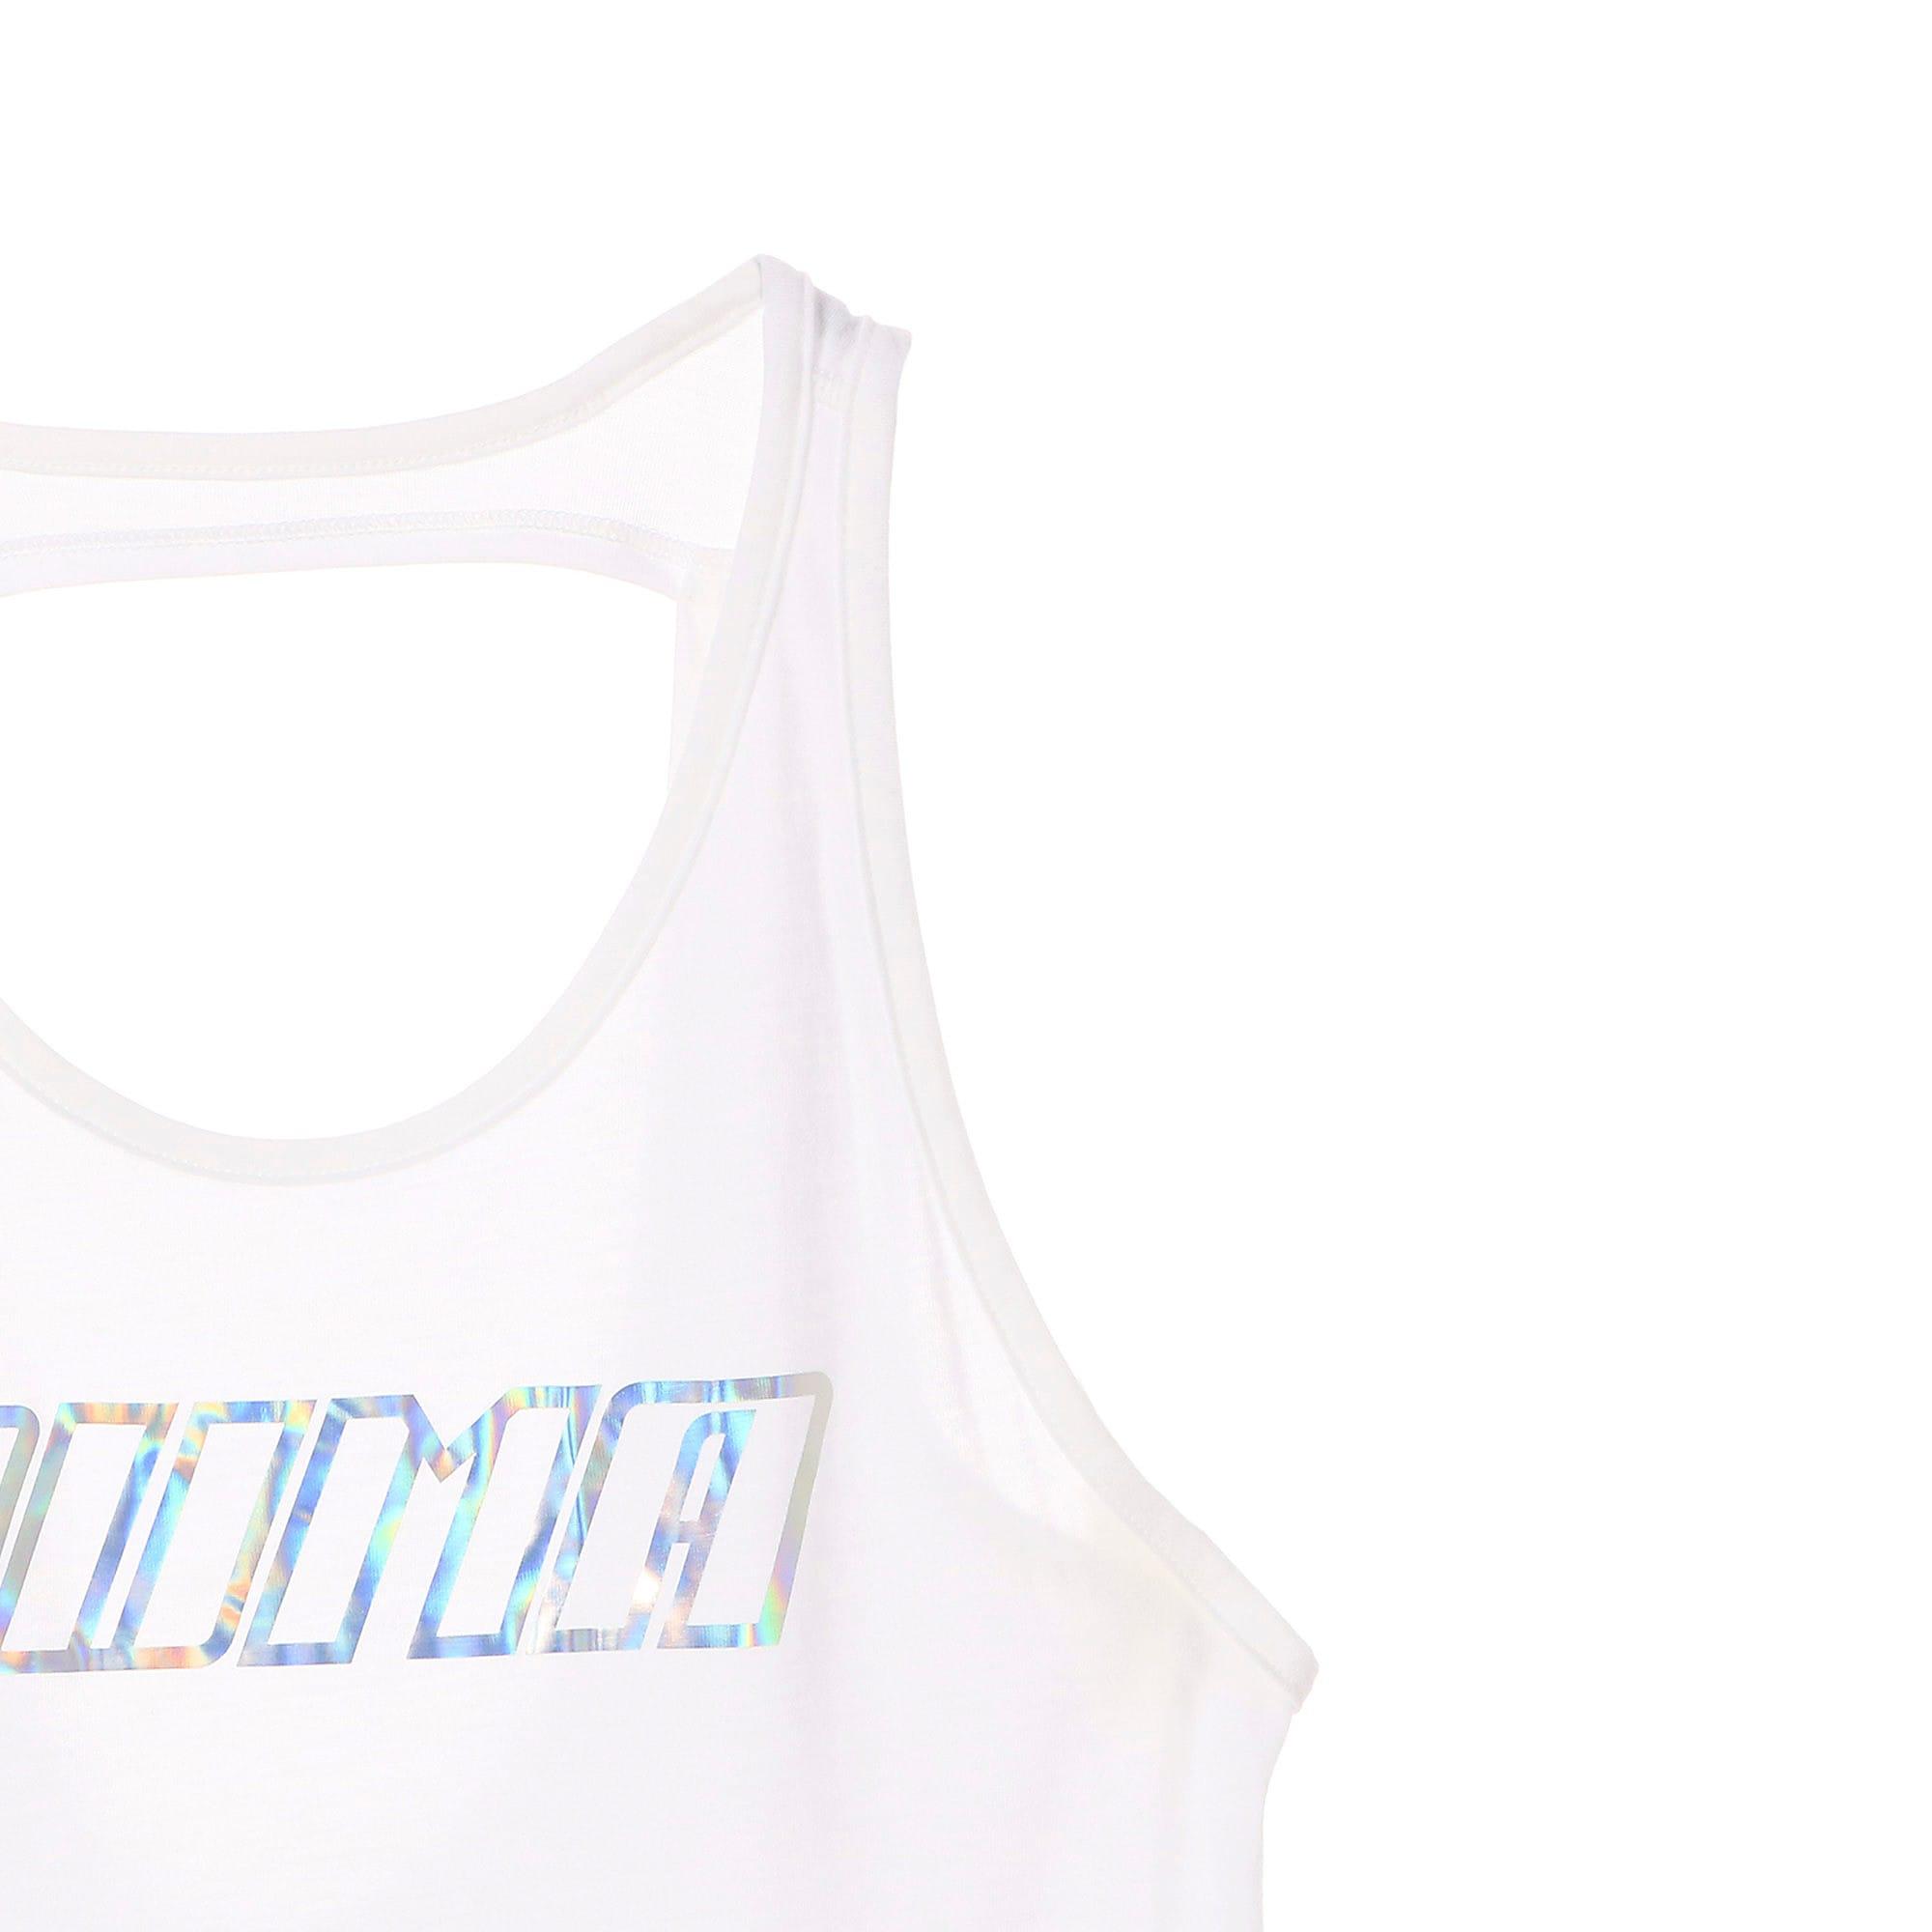 Thumbnail 8 of オウンイット ウィメンズ タンク, Puma White-PUMA wording, medium-JPN